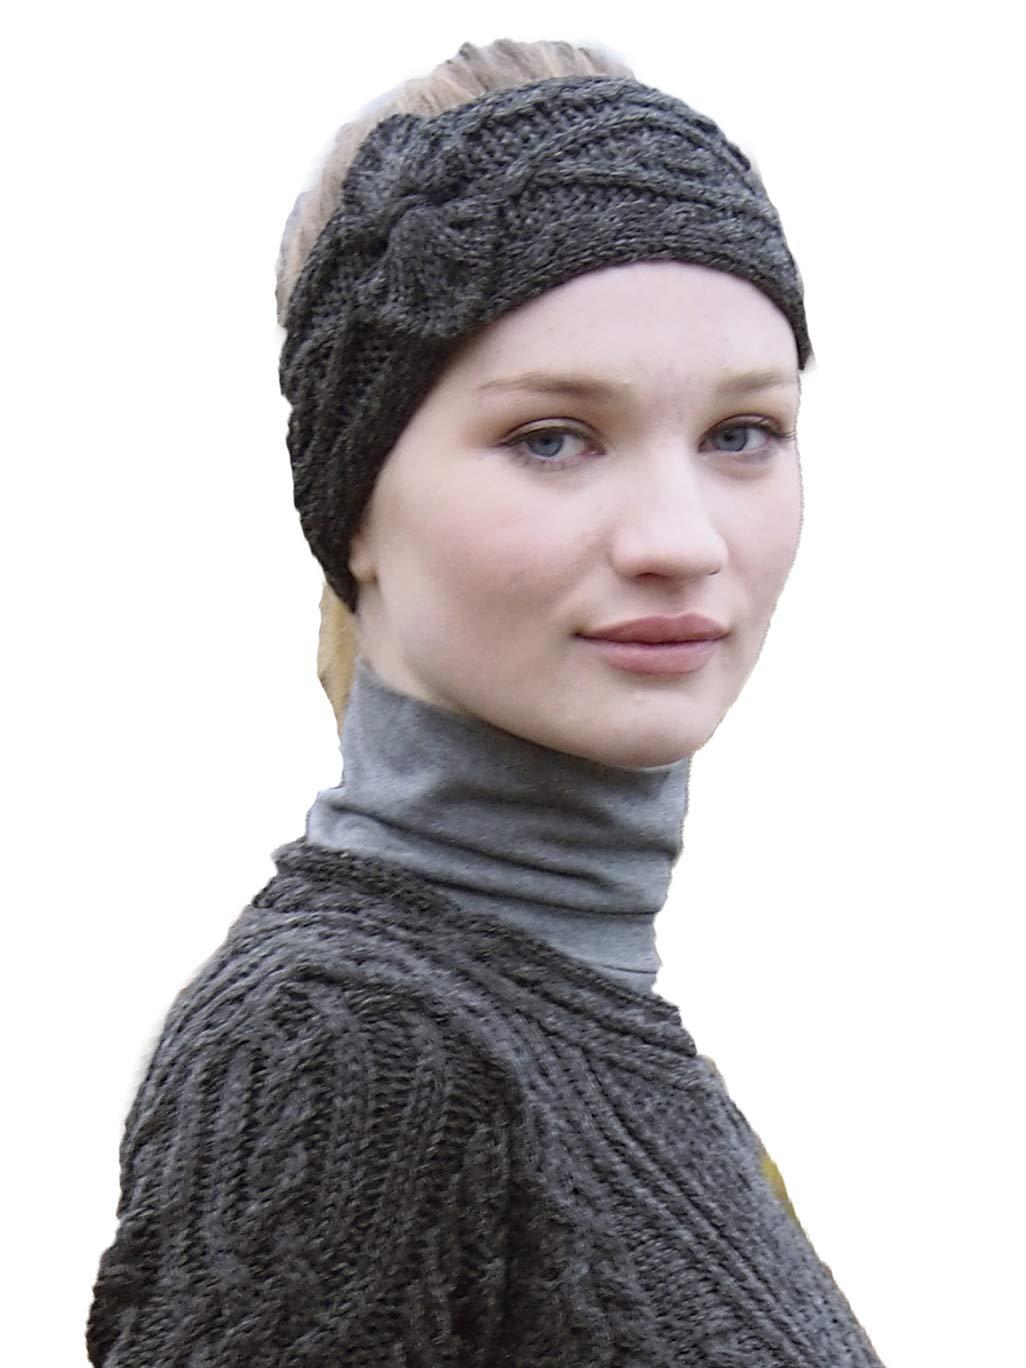 Aran Crafts Headband (100% Merino Wool) One Size Charcoal (X4341-CHAR) by Aran Crafts Ireland